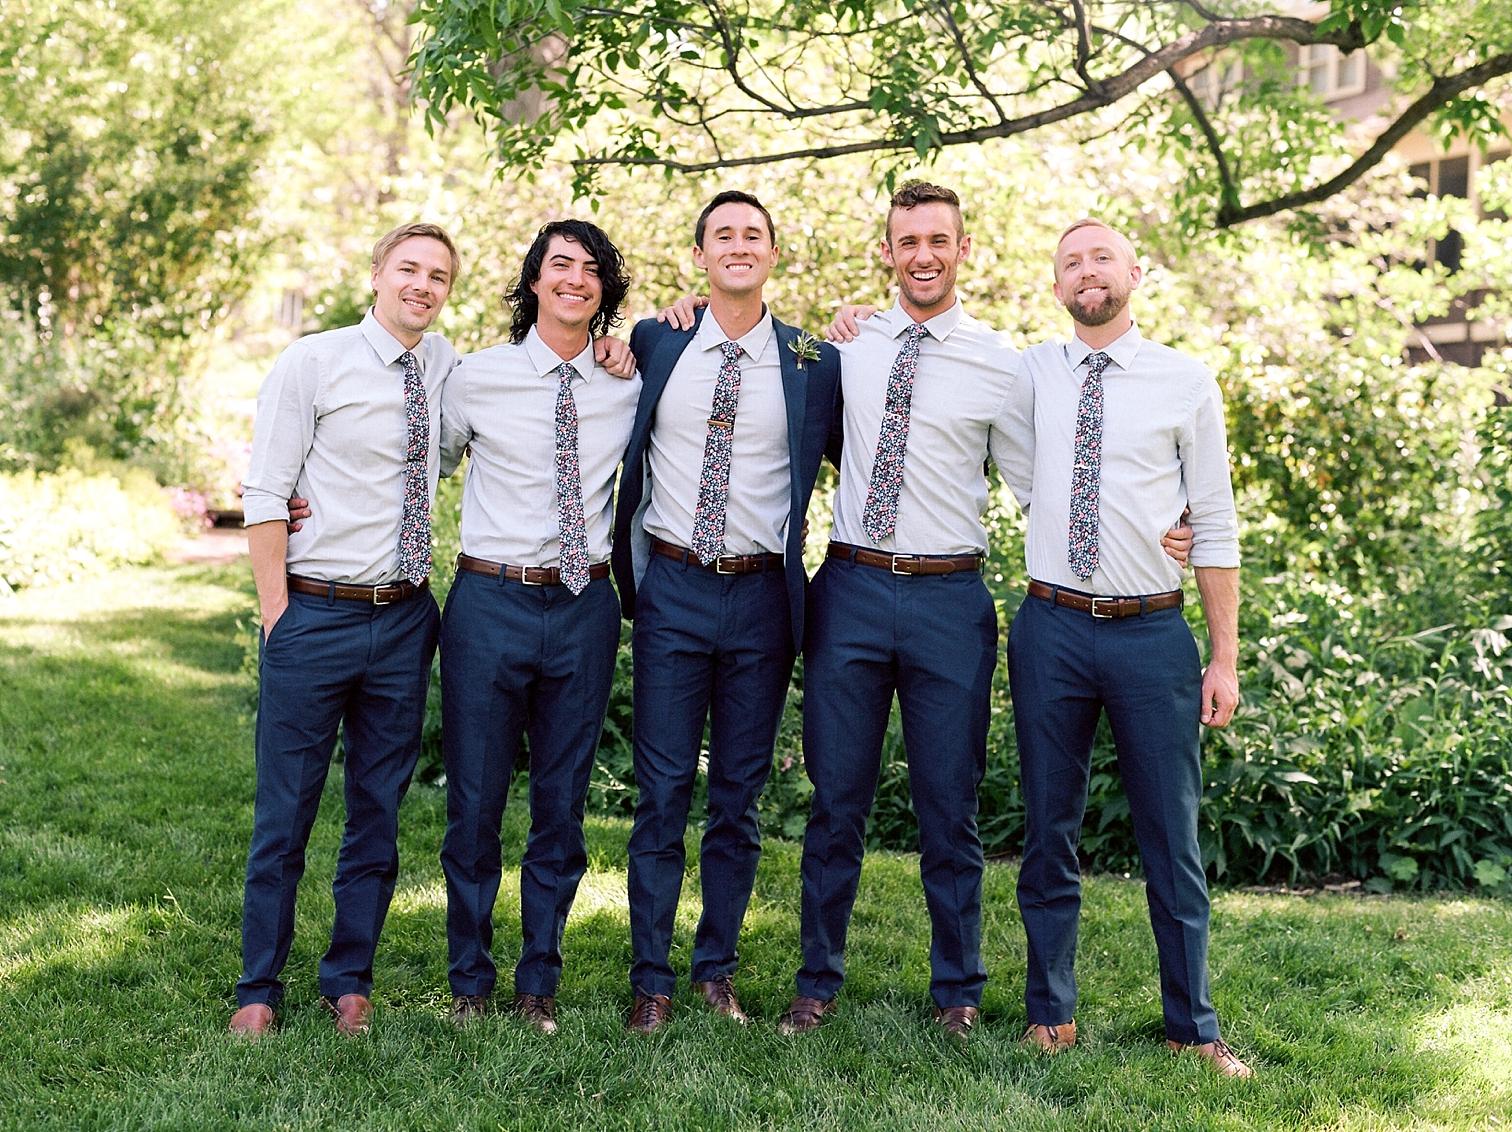 Outdoor Wedding Details, Colorado Mountain Weddings, Danielle DeFiore Photographer, Destination Wedding Photographers, Weddings in Boulder Colorado, Outdoor Ceremony, Film Photographer, Groomsmen